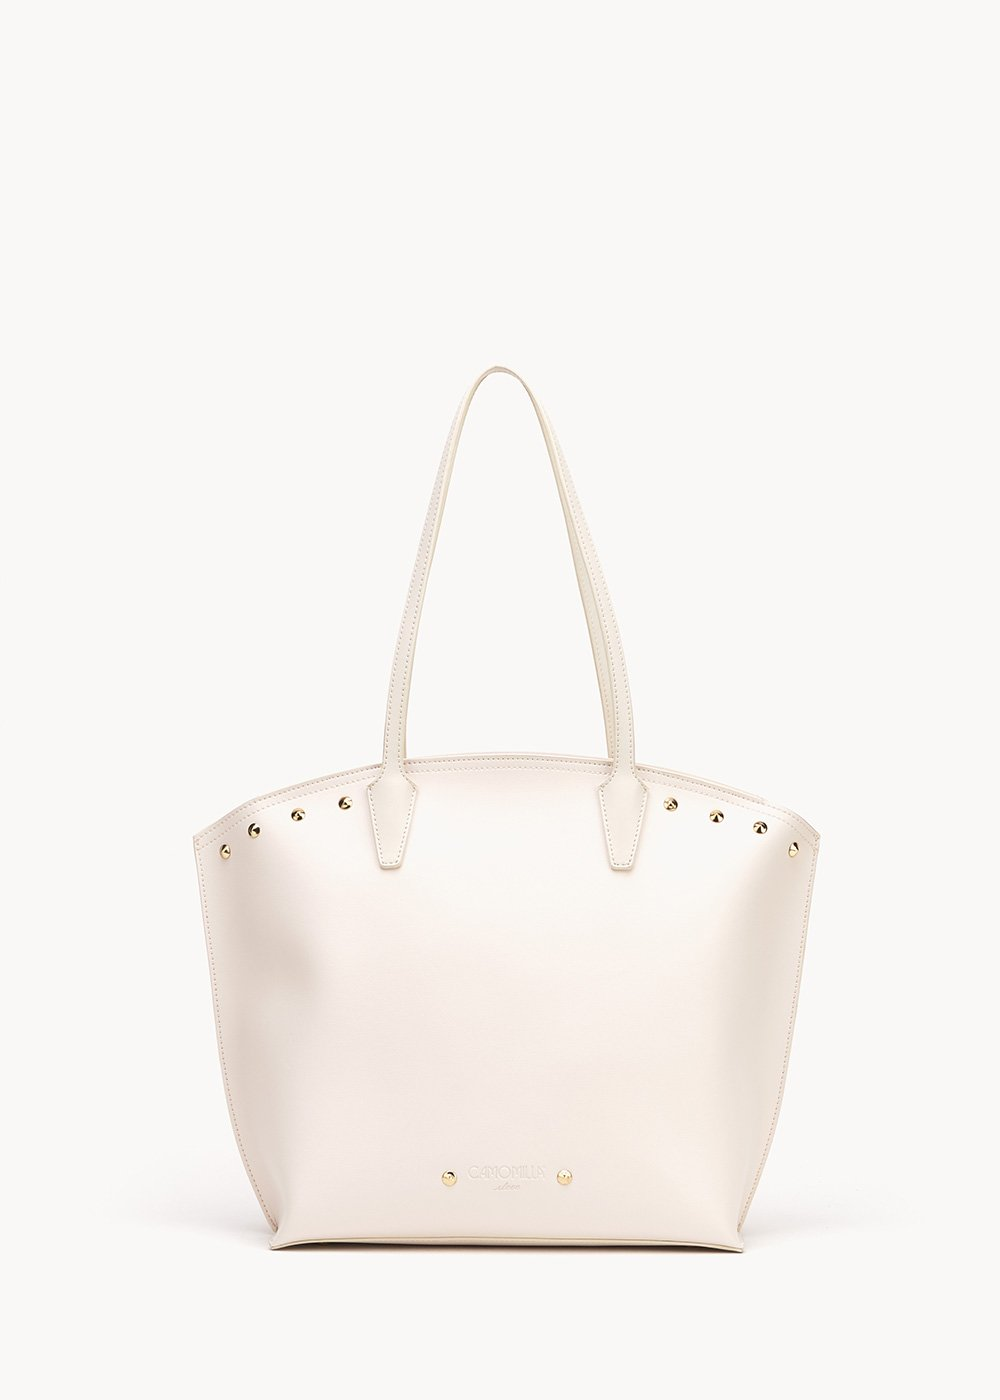 Shopping bag Brynn - Light Beige - Donna